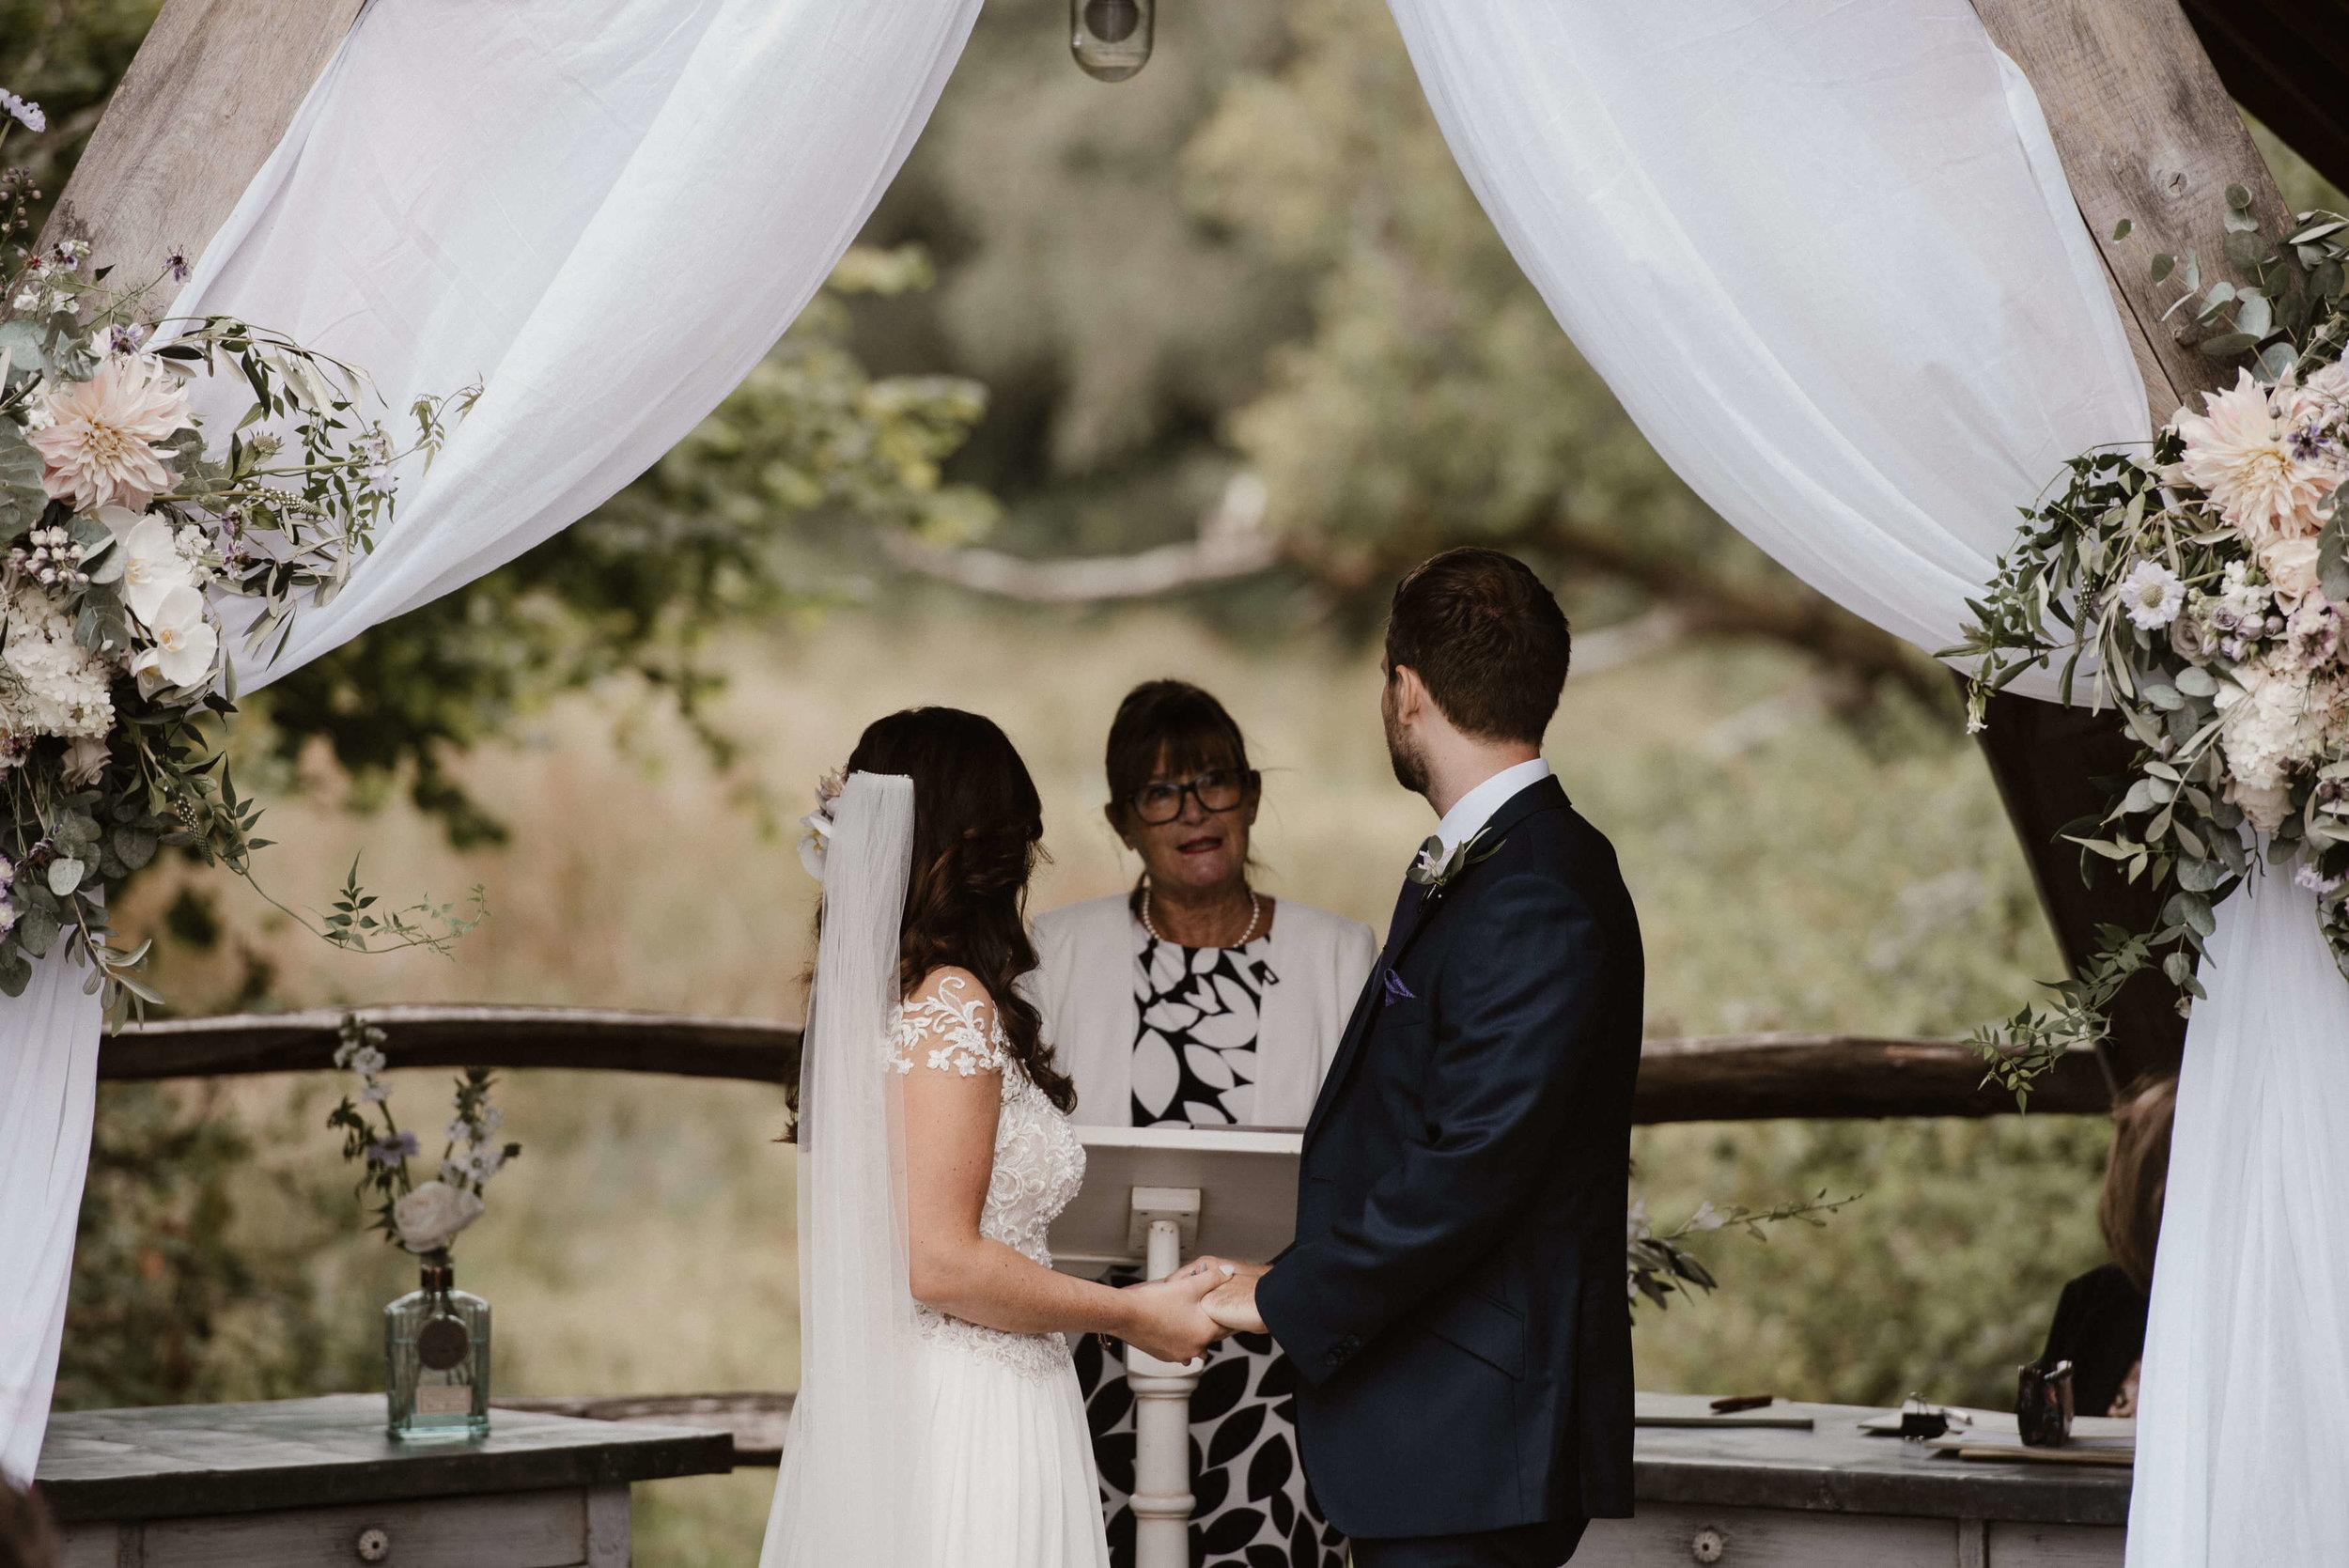 Nat and Tom - 05 - Ceremony - Sara Lincoln Photography-90.jpg